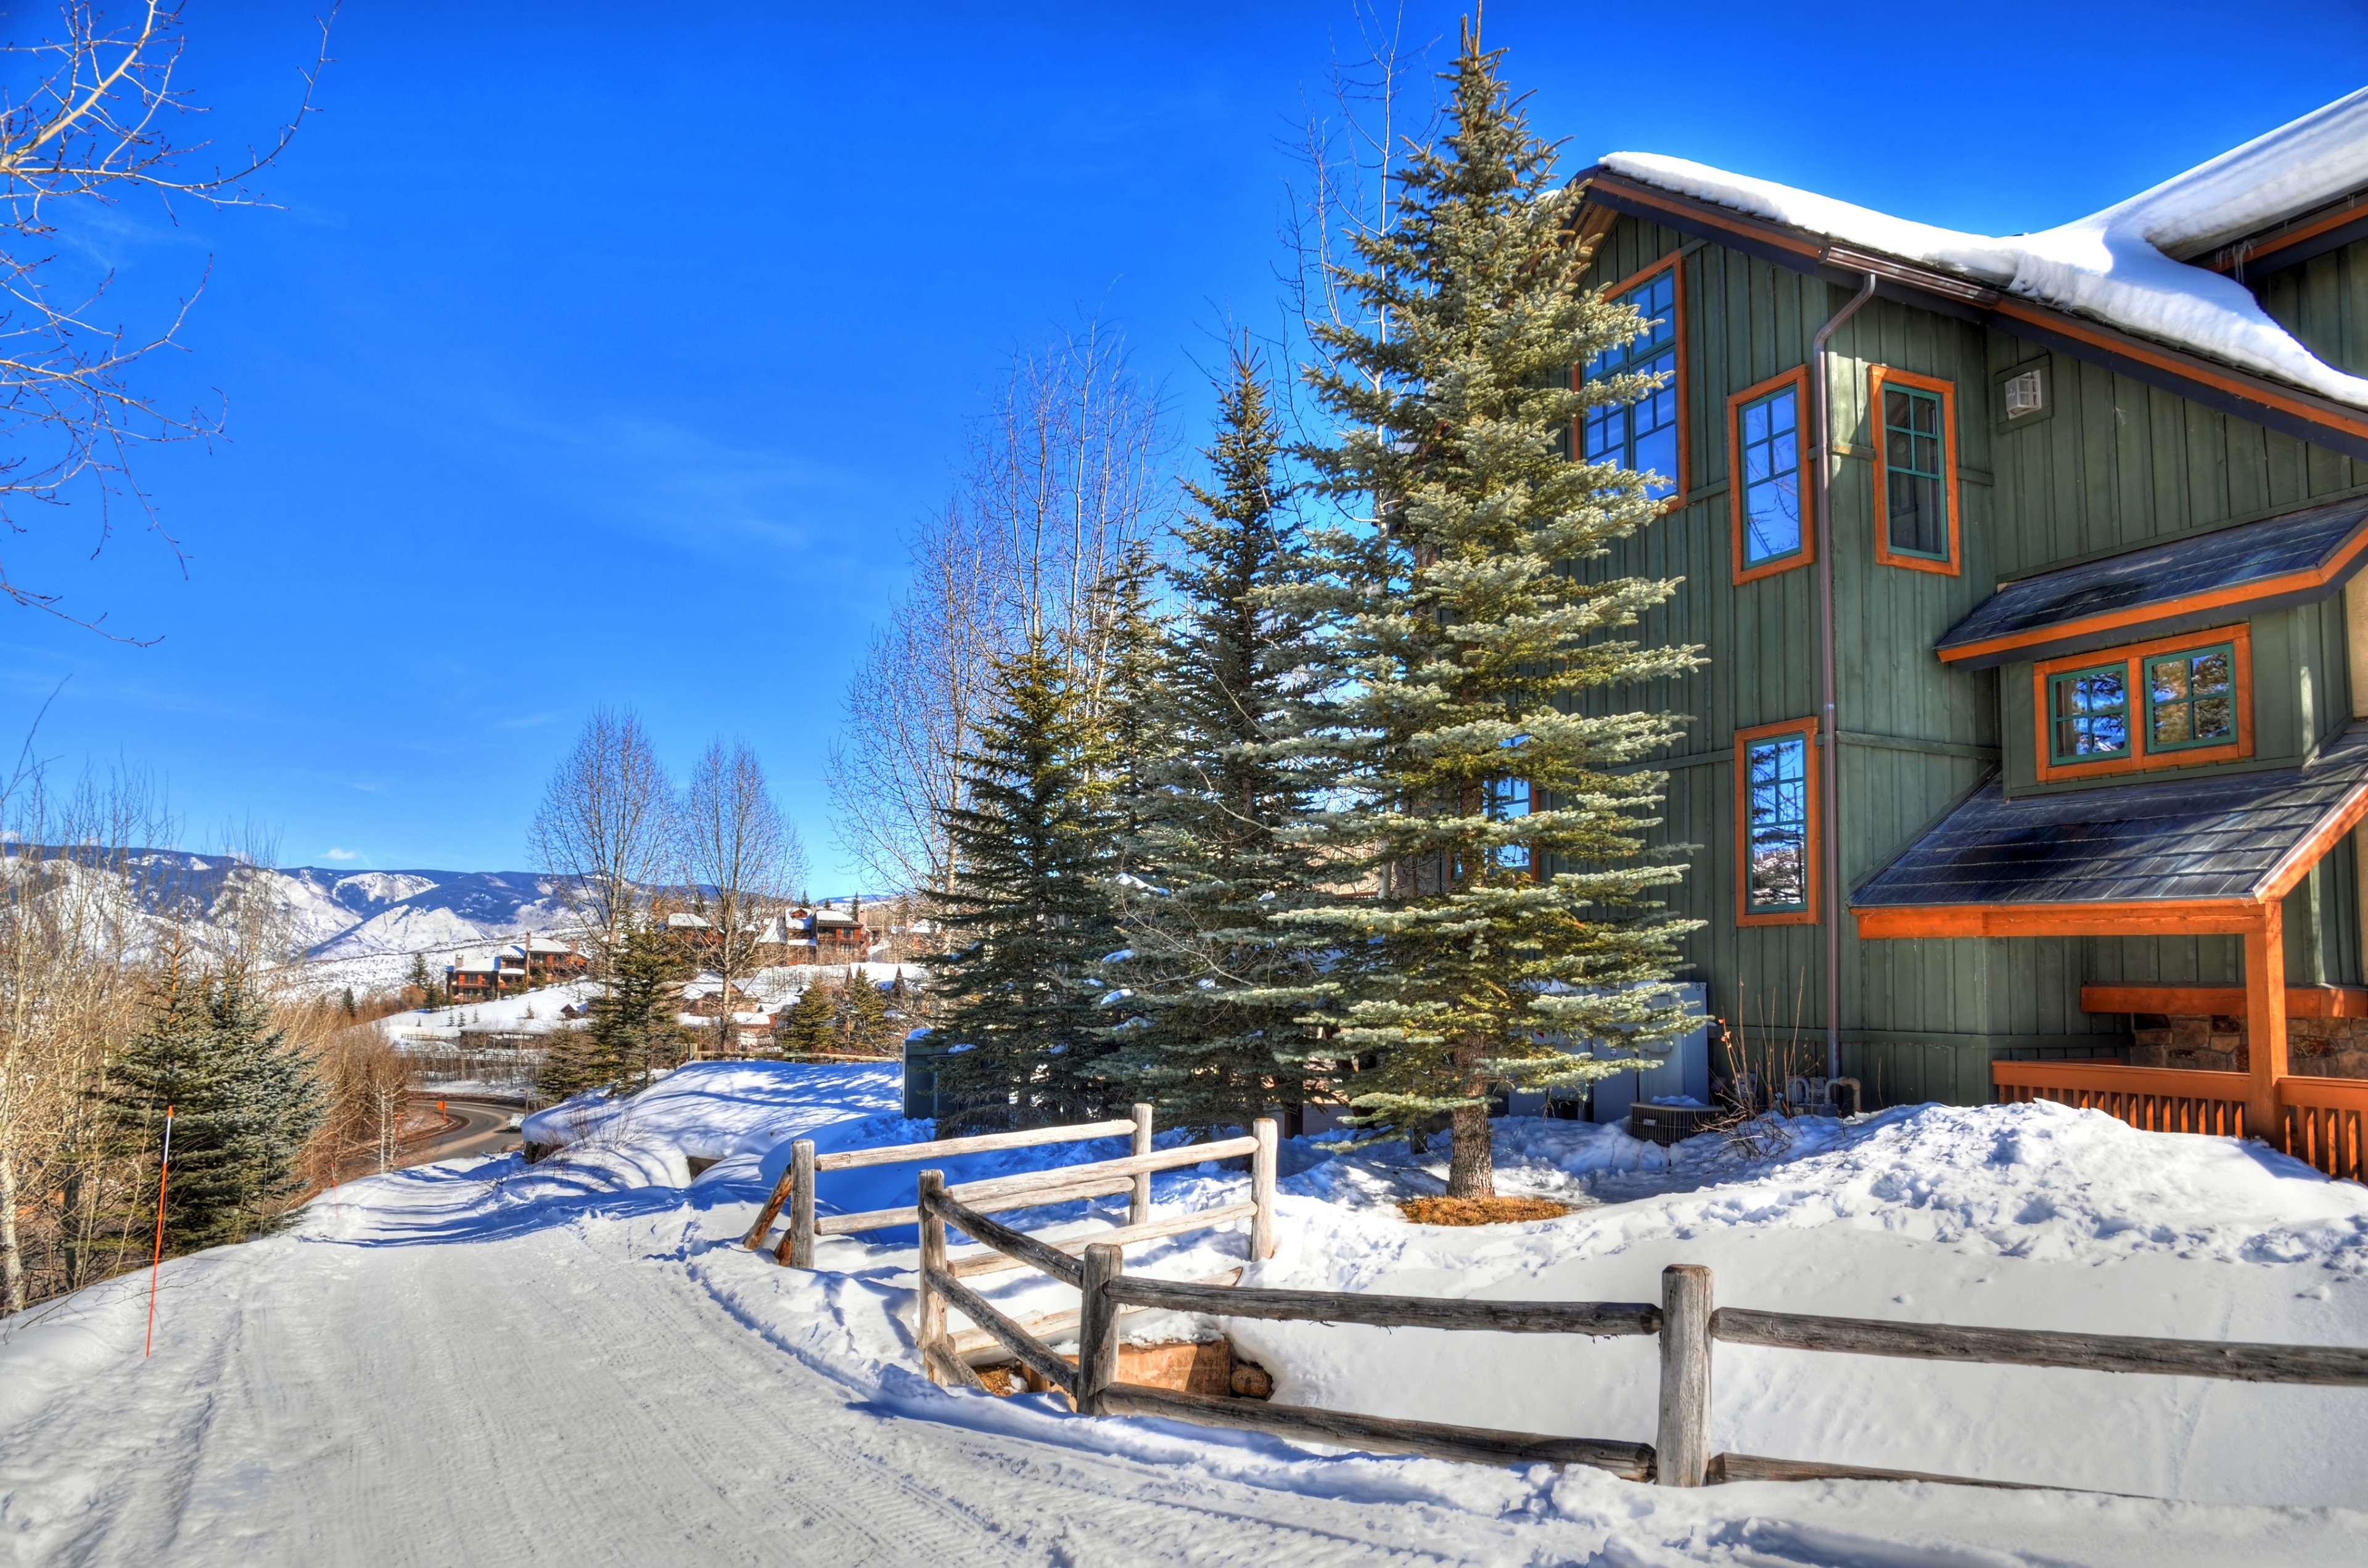 Snowmass Mountain Condominiums, Snowmass Village, Colorado, United States of America